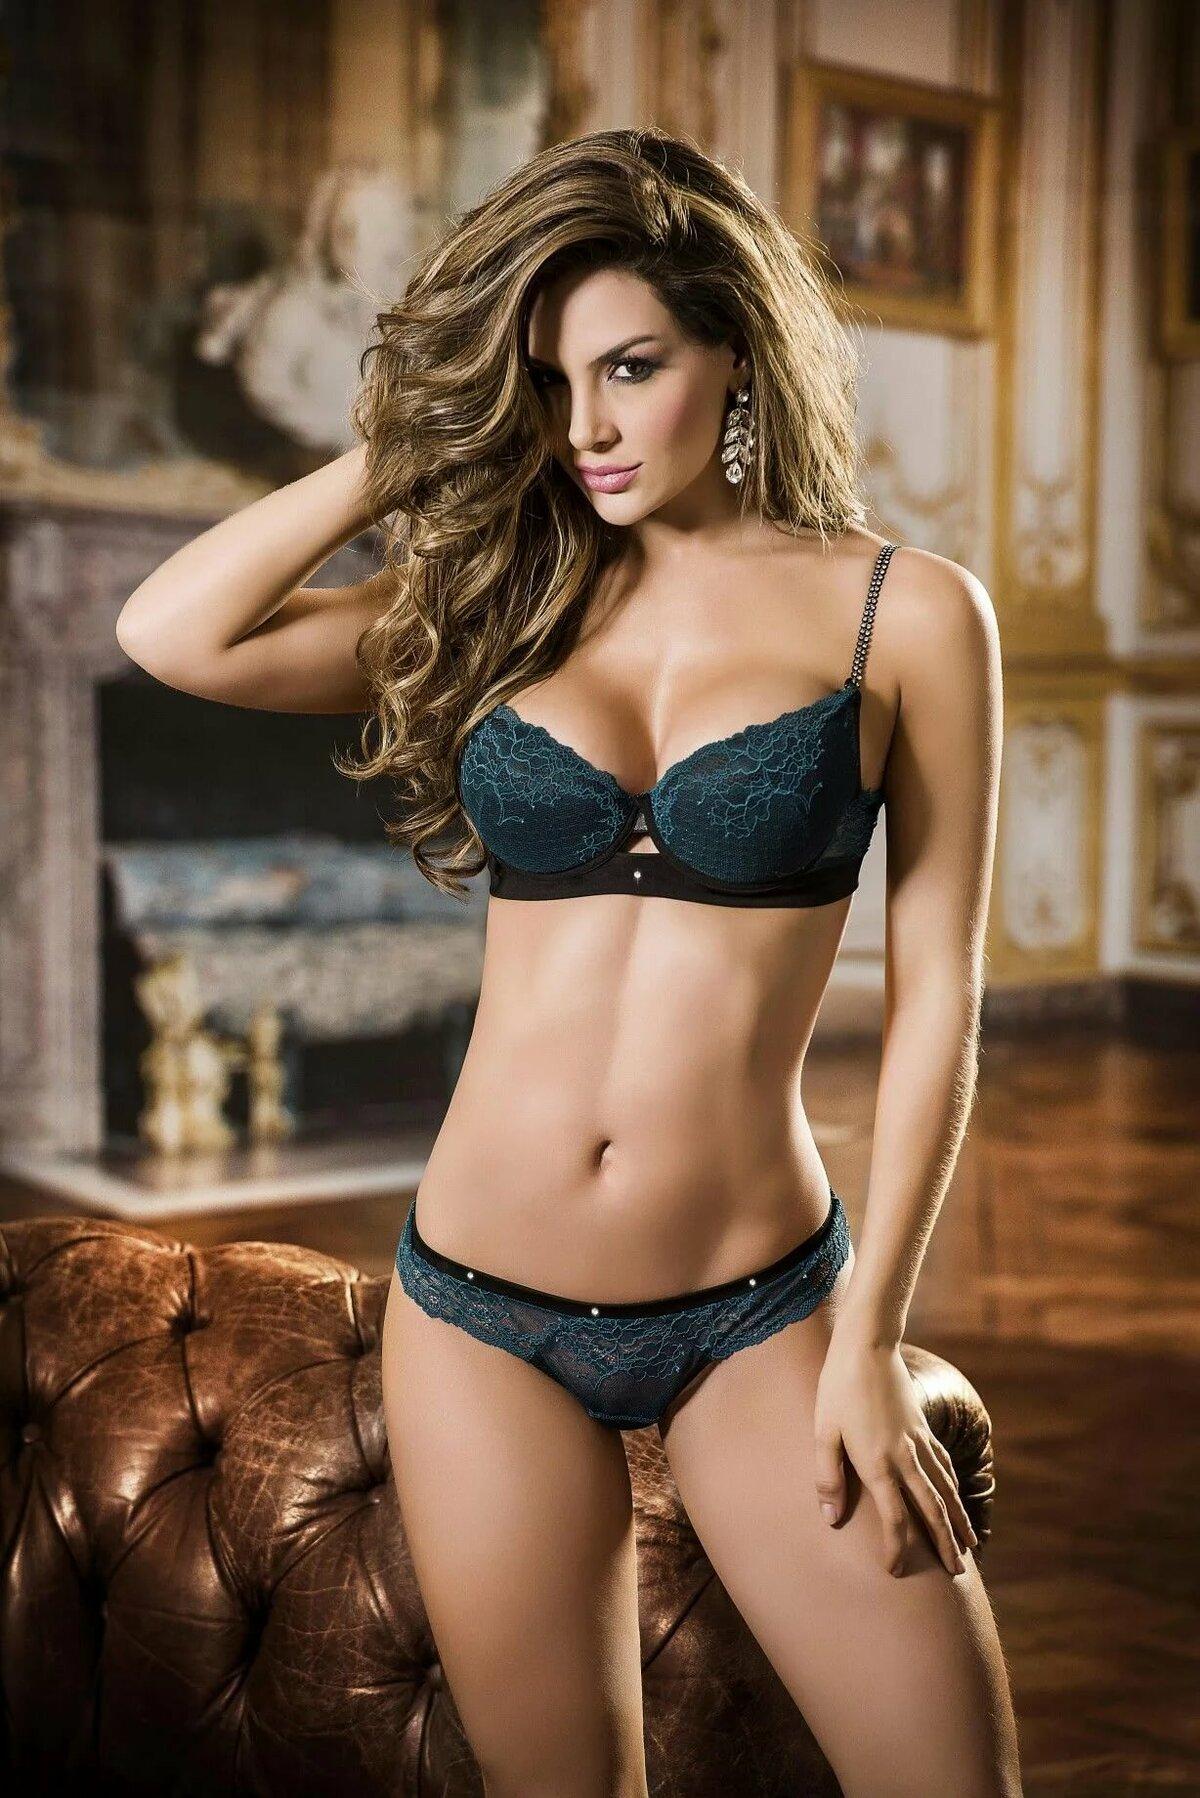 Hottest sexiest women bizarre